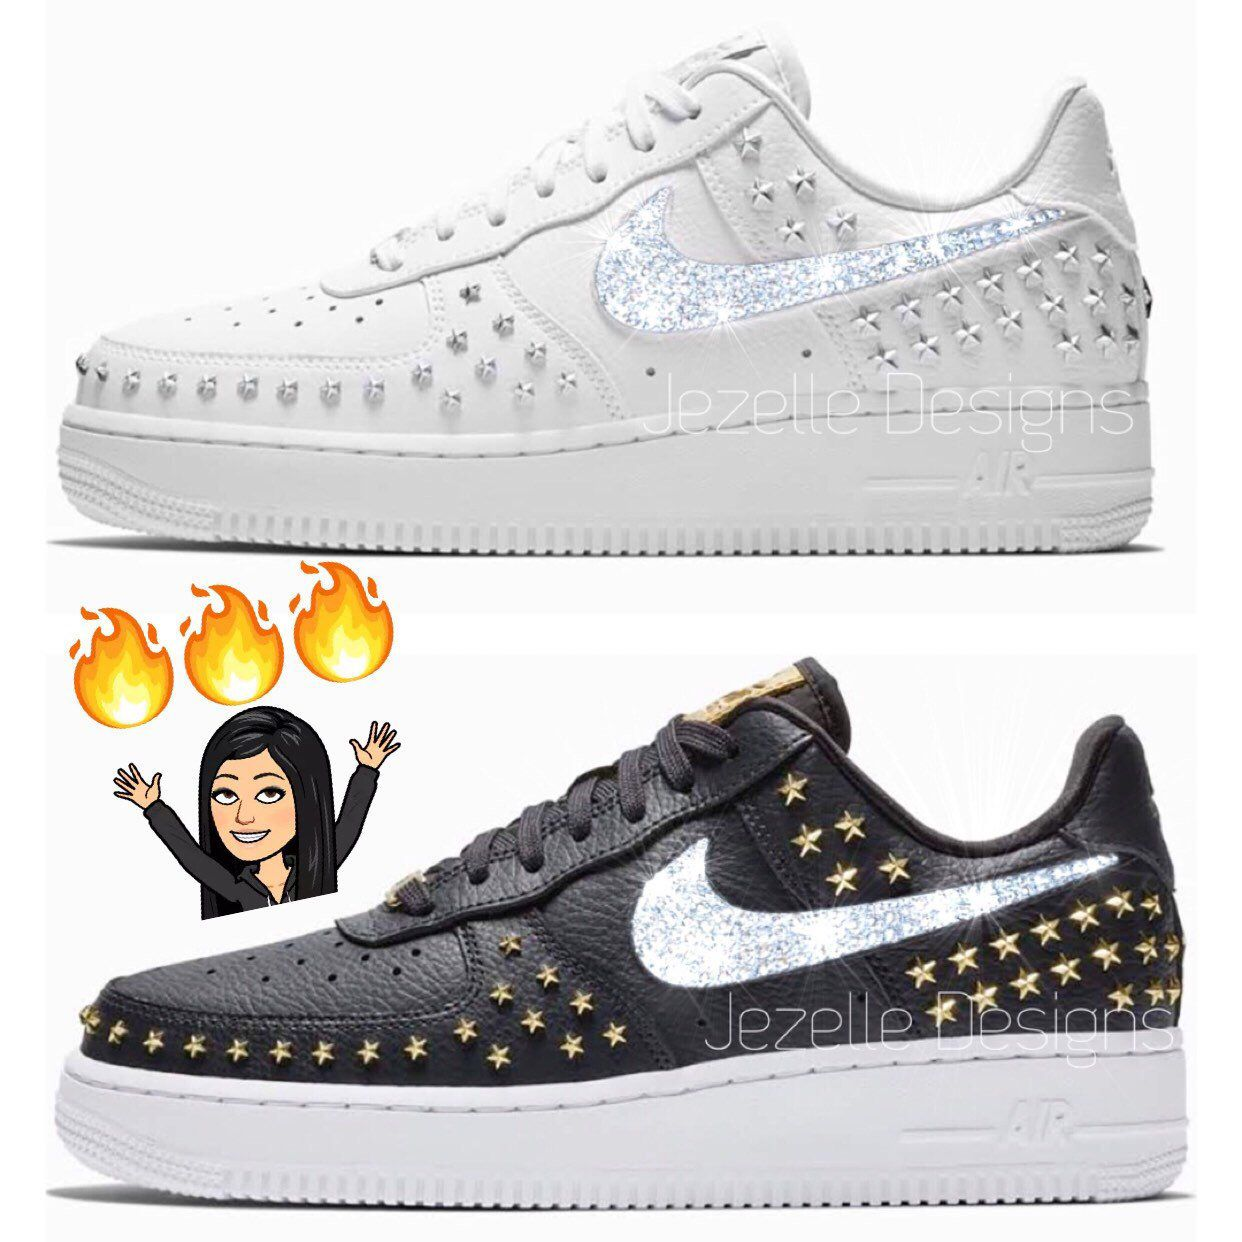 RESTOCKED! Swarovski Nike Air Force 1 '07 for Women